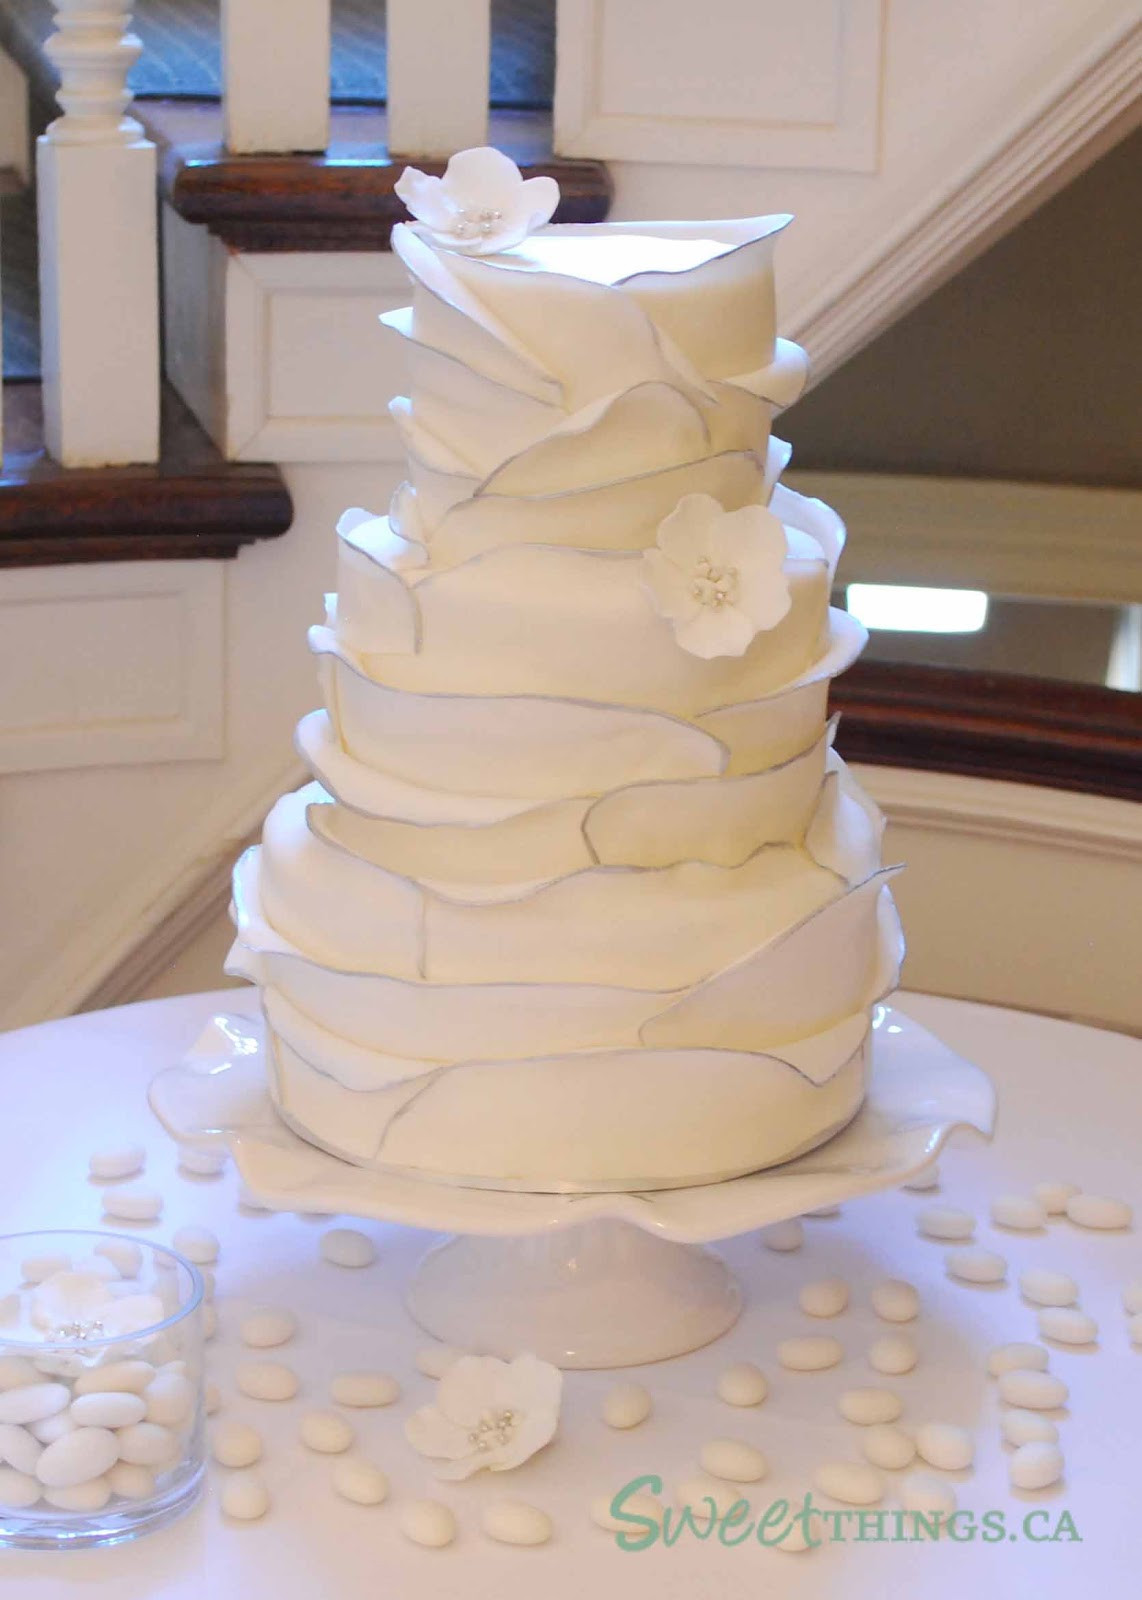 Ruffle Wedding Cakes  SweetThings Ruffled Wedding Cake